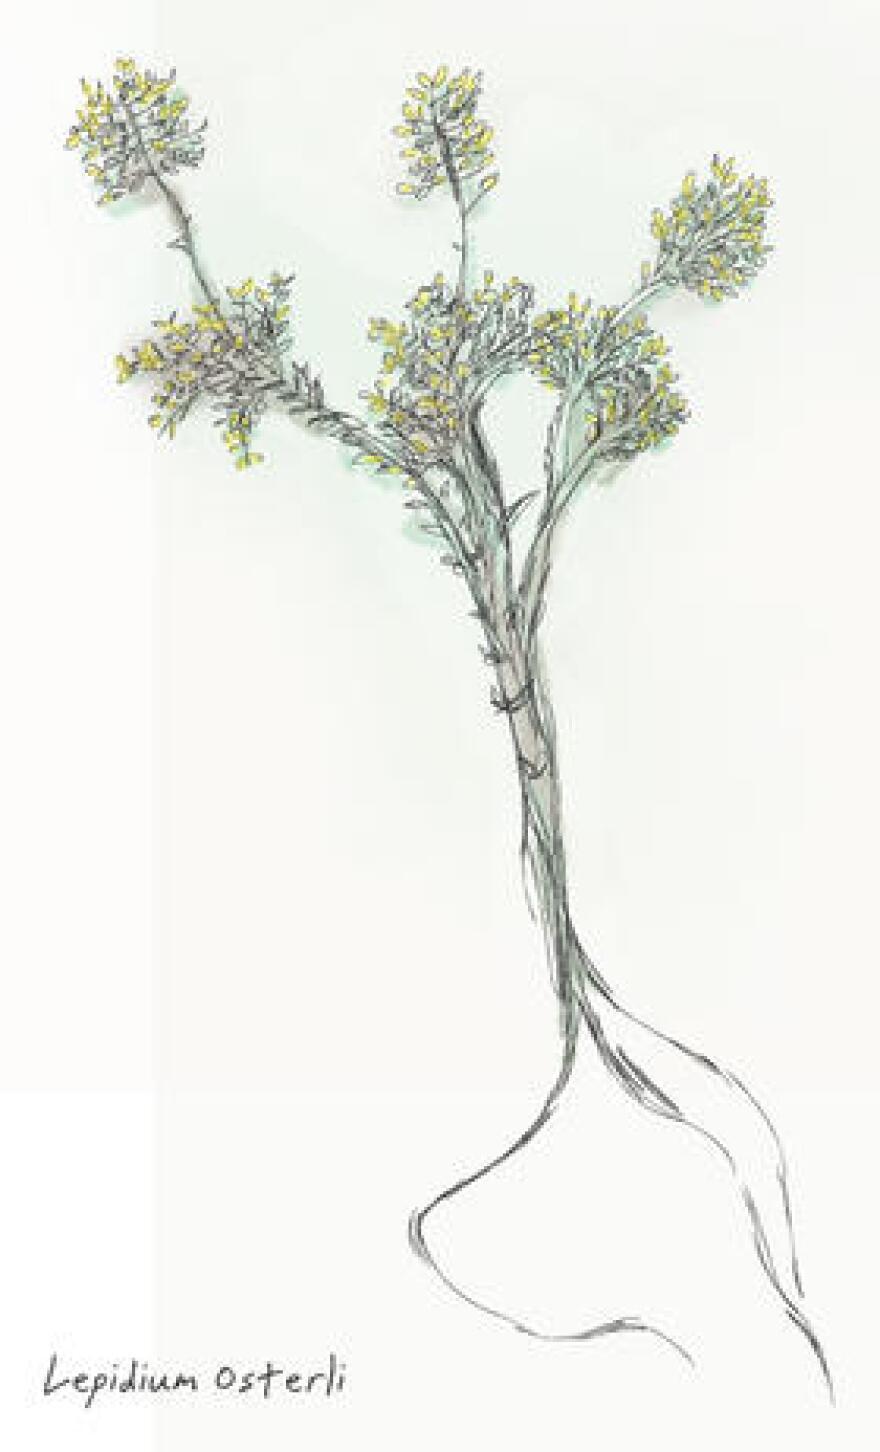 Lepidium Osterli, also known as Ostler's peppergrass, Ostler's pepperweed or Ostler's pepper plant.